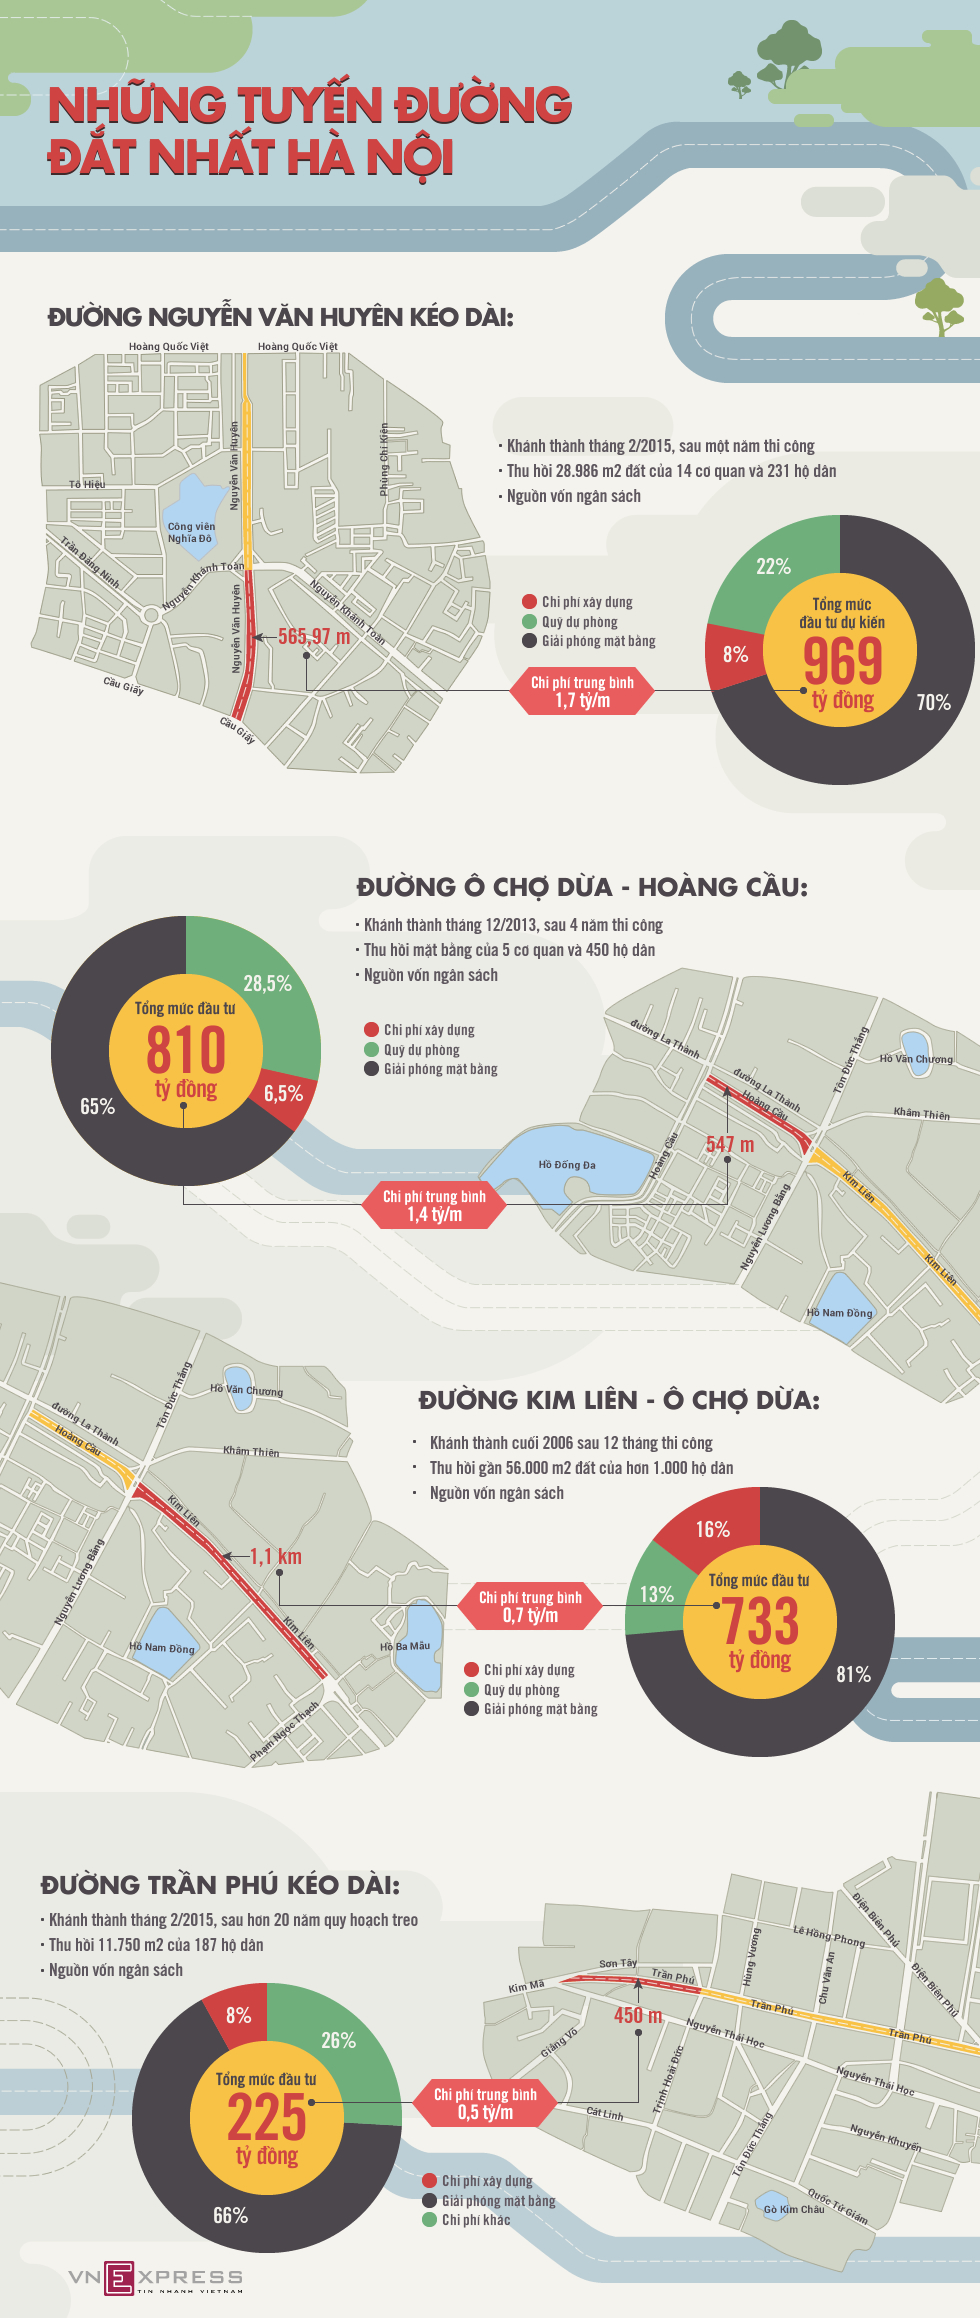 Hanoi-1425269185